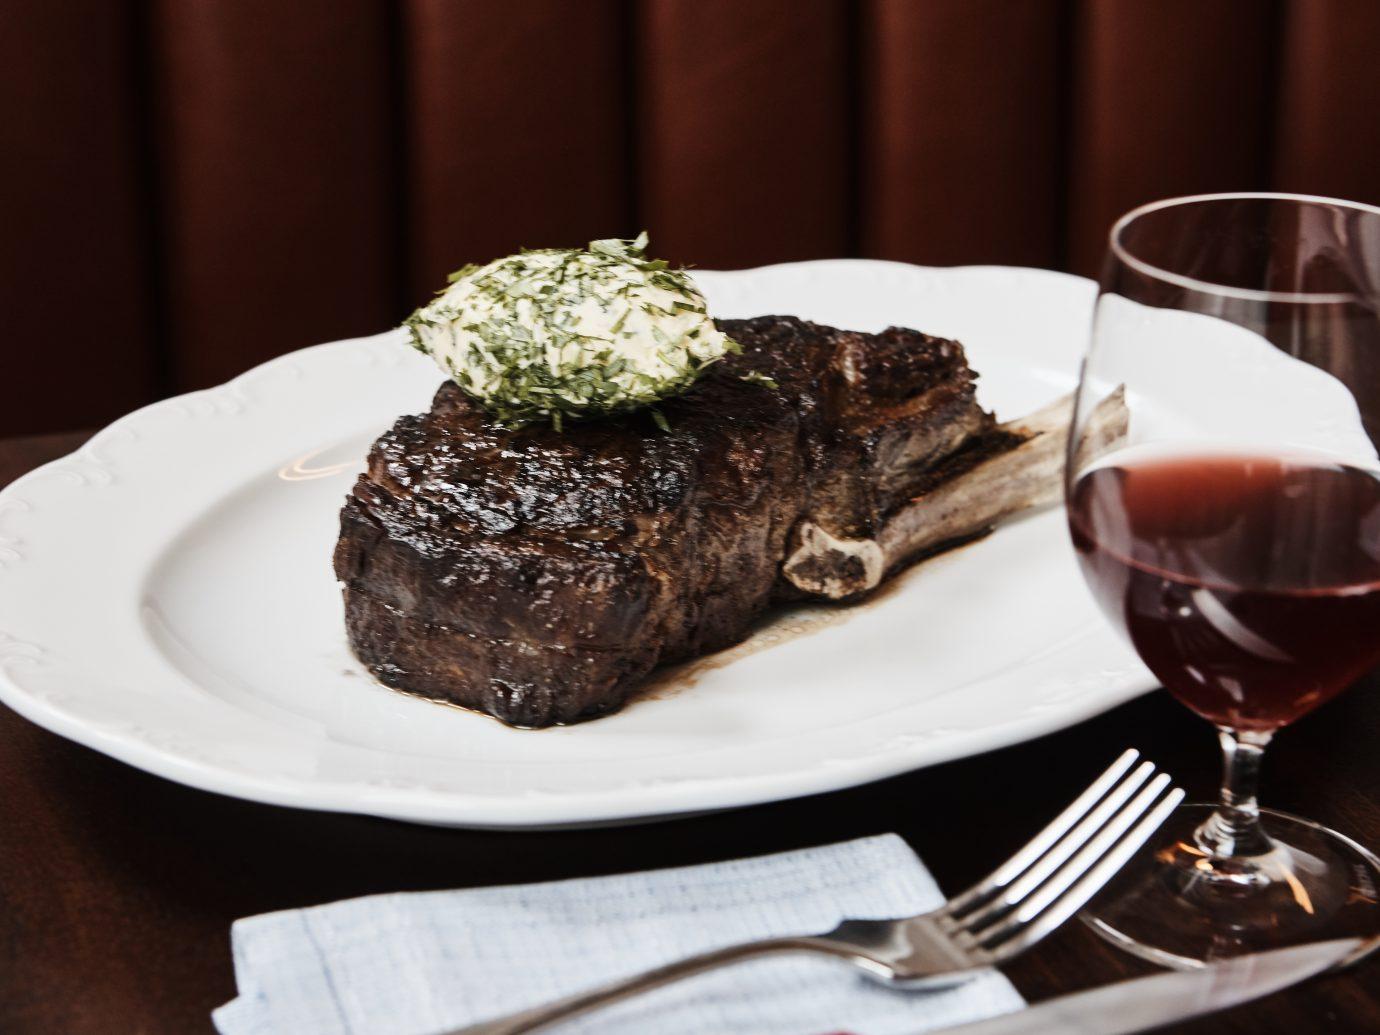 Frenchette steak and wine